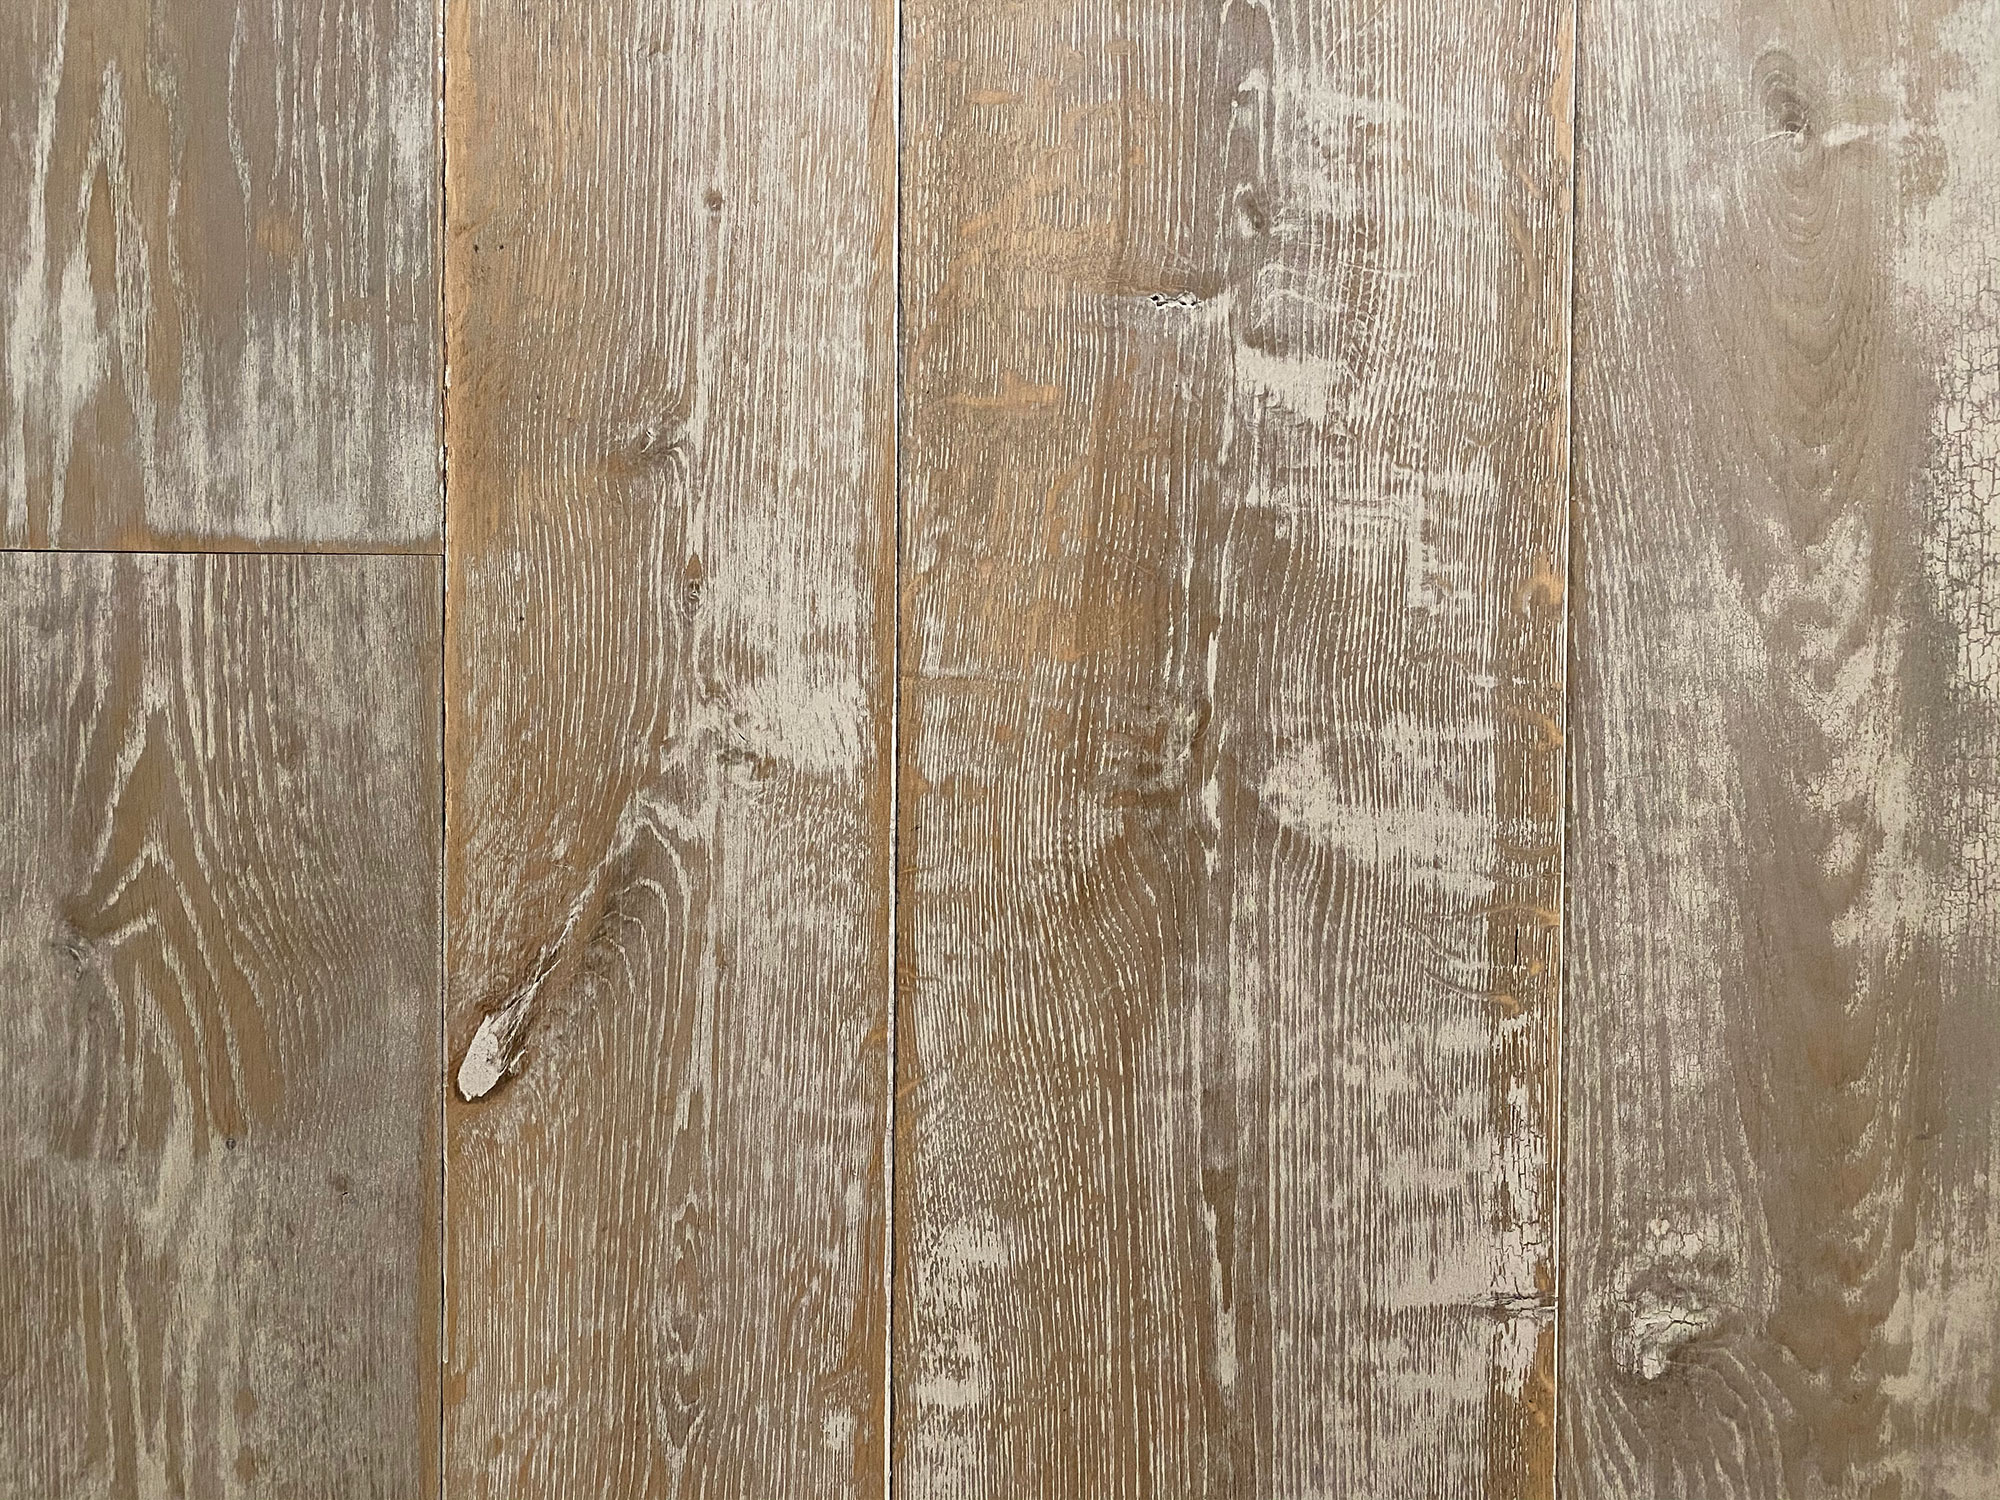 Crackled paint on oak flooring